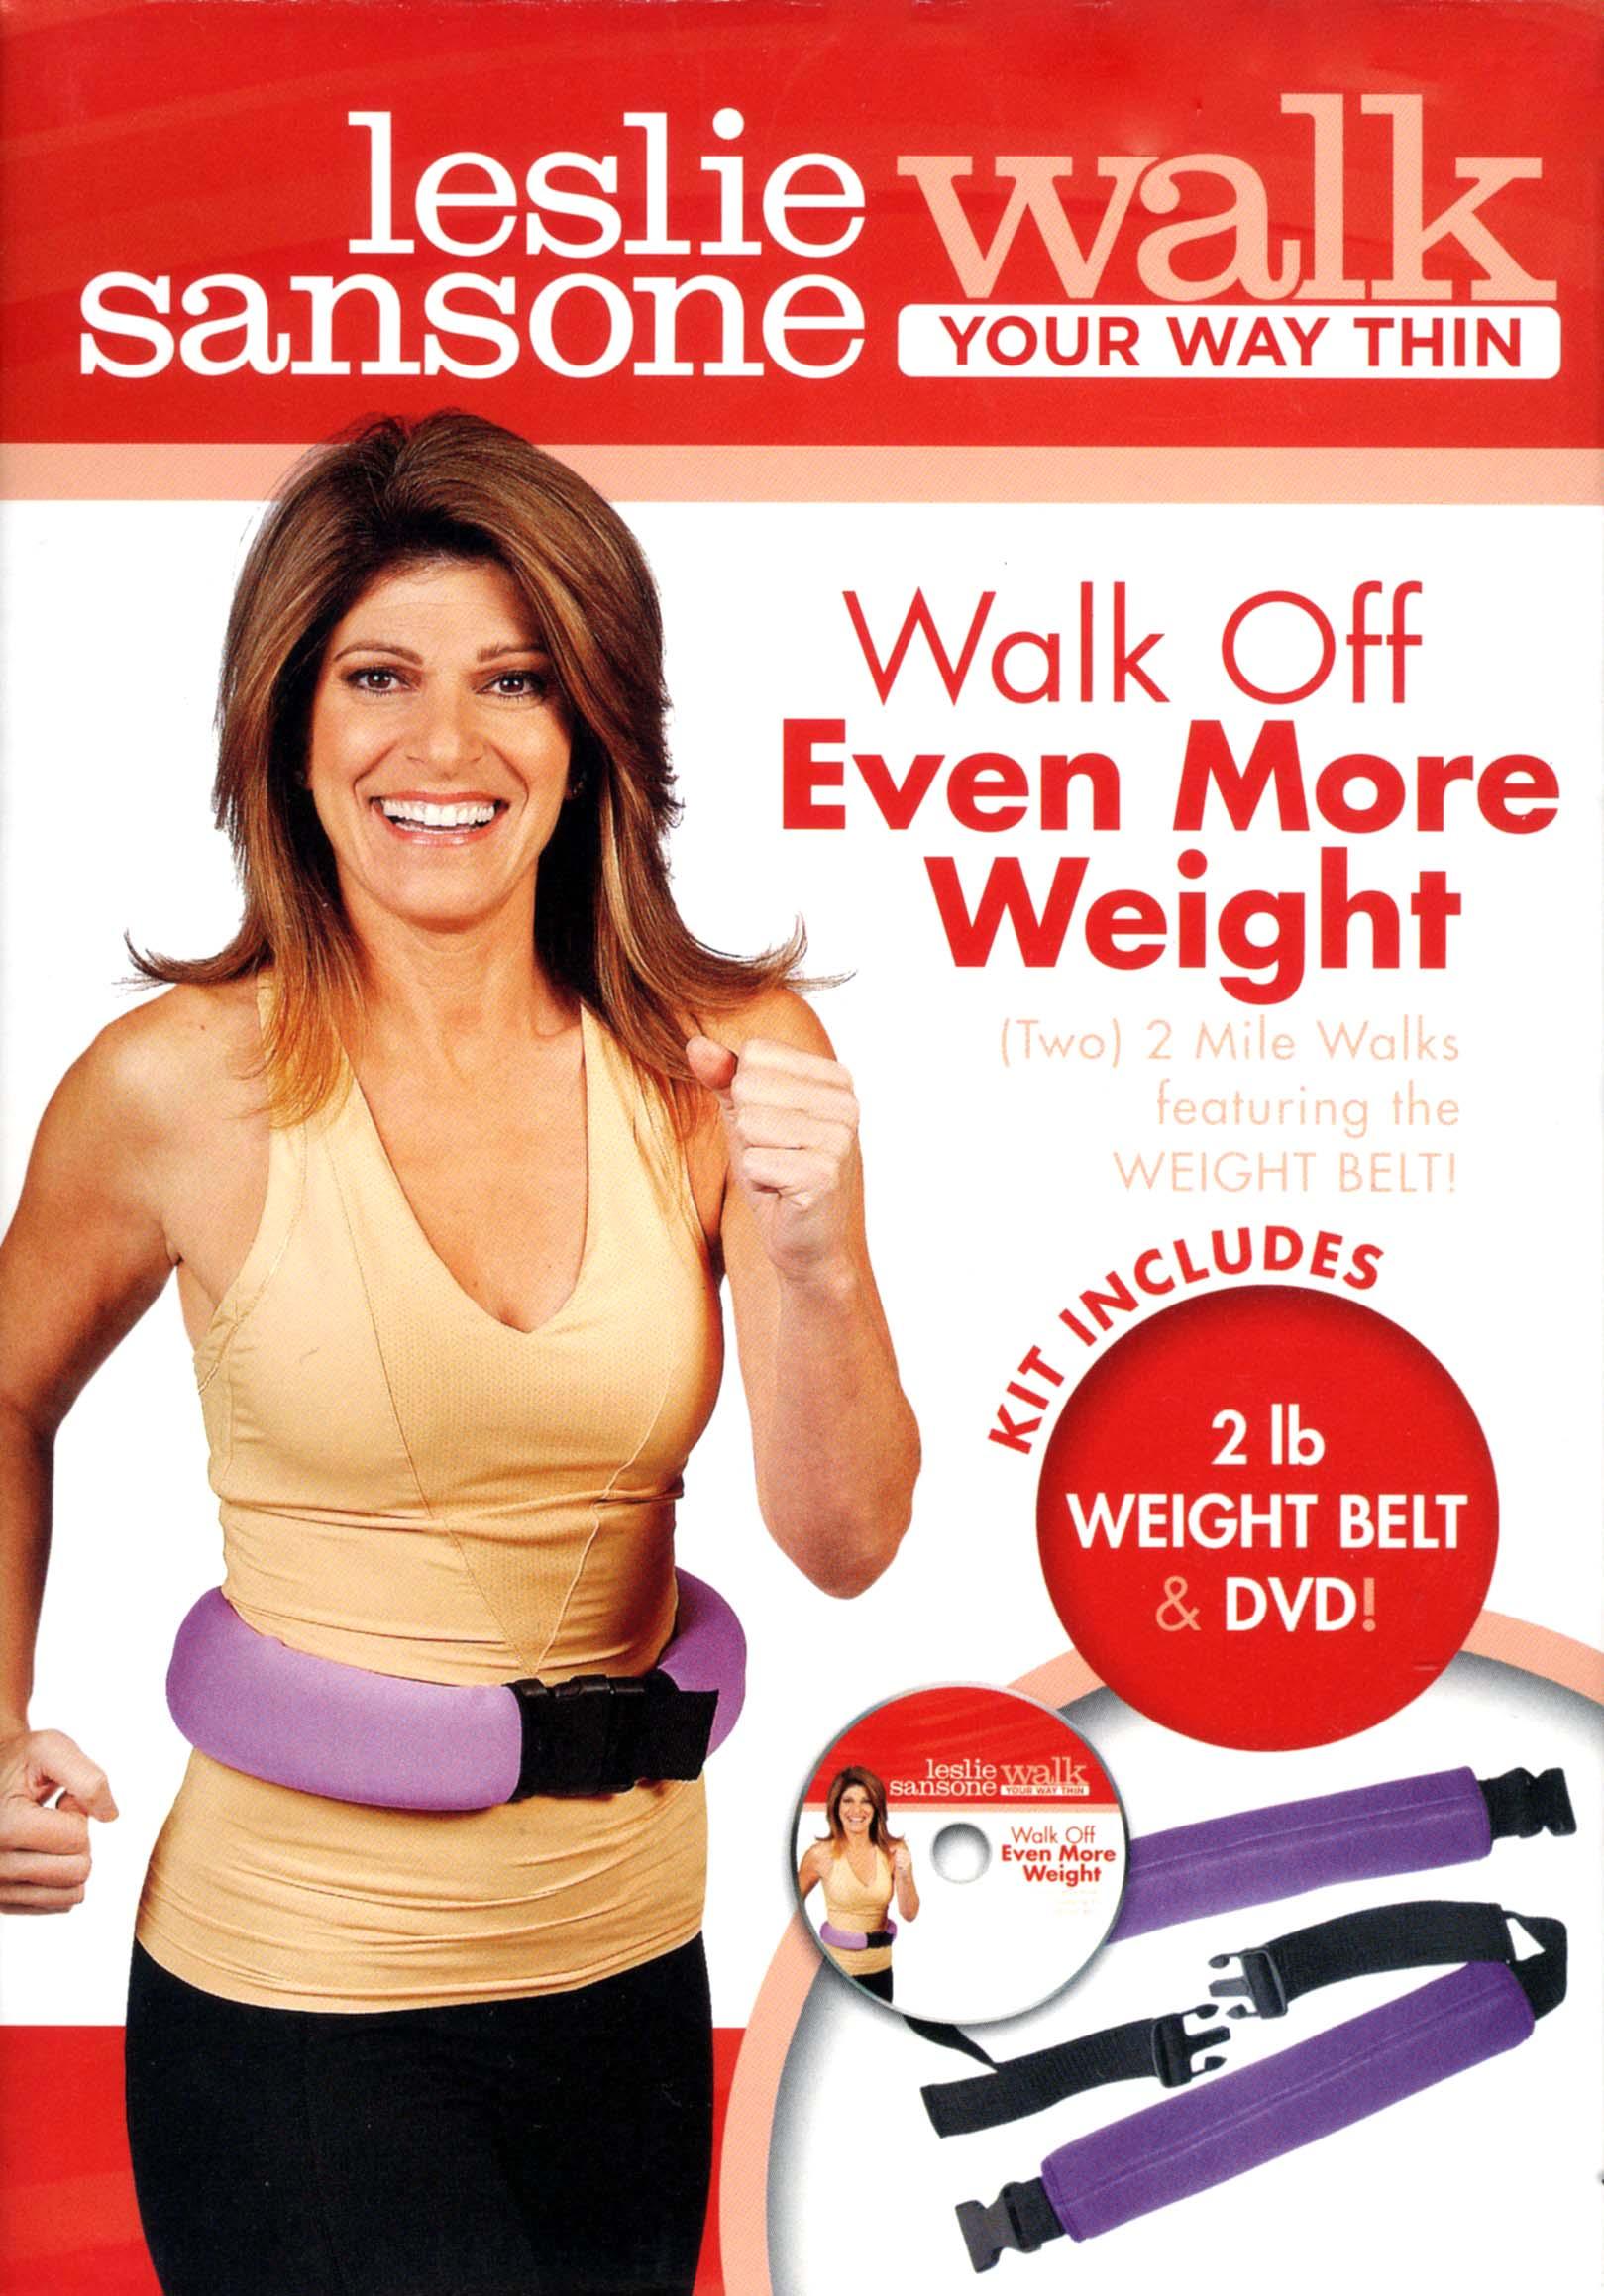 Leslie Sansone: Walk Your Way Thin - Walk Off Even More Weight